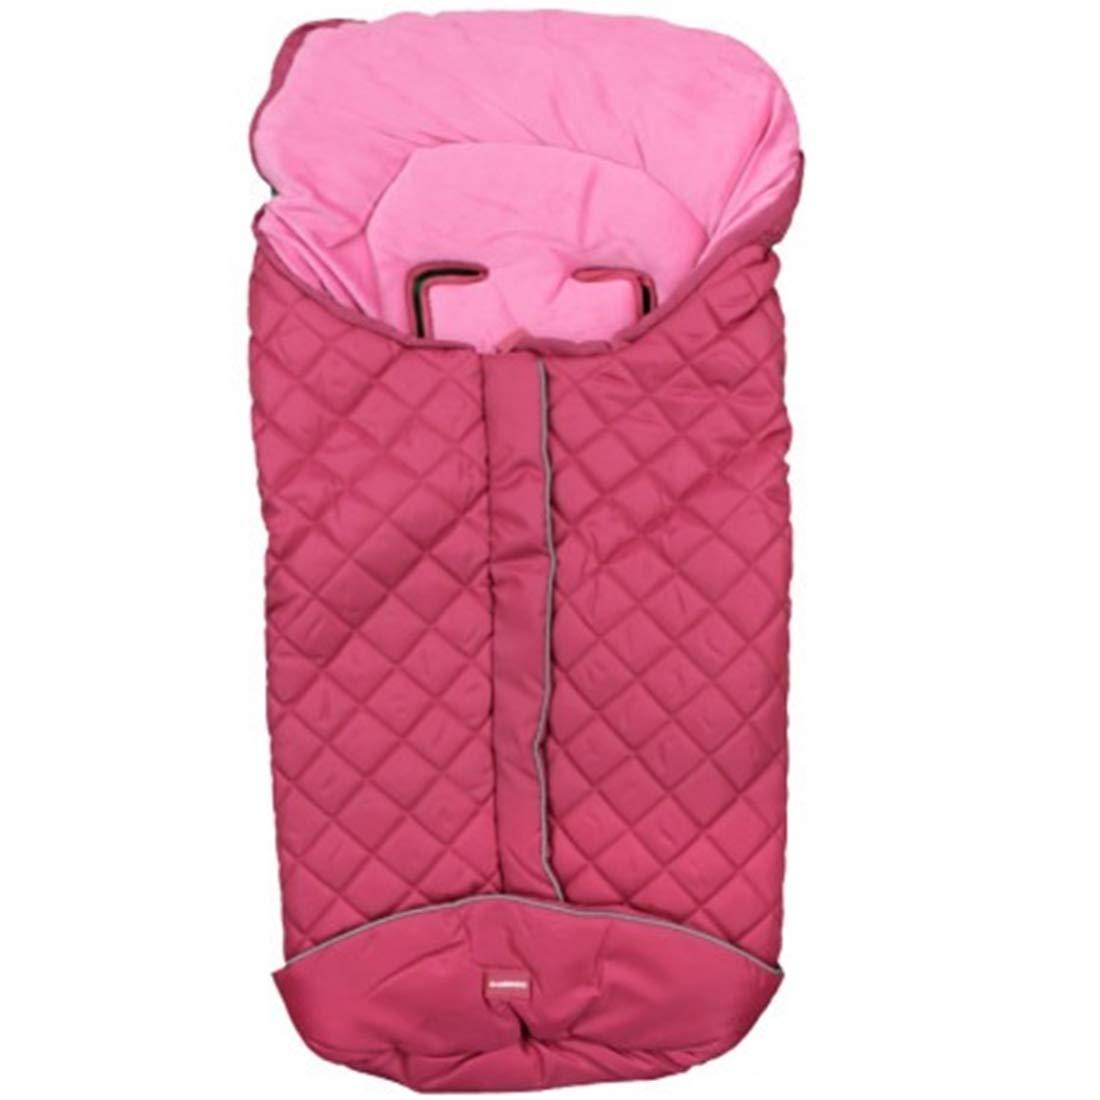 Textures Home Sleeping Bag–Universal Chair Indoor Coralina Fuchsia Check Waterproof 9648+ Gift Pen Exclusive TEXTURAS HOME